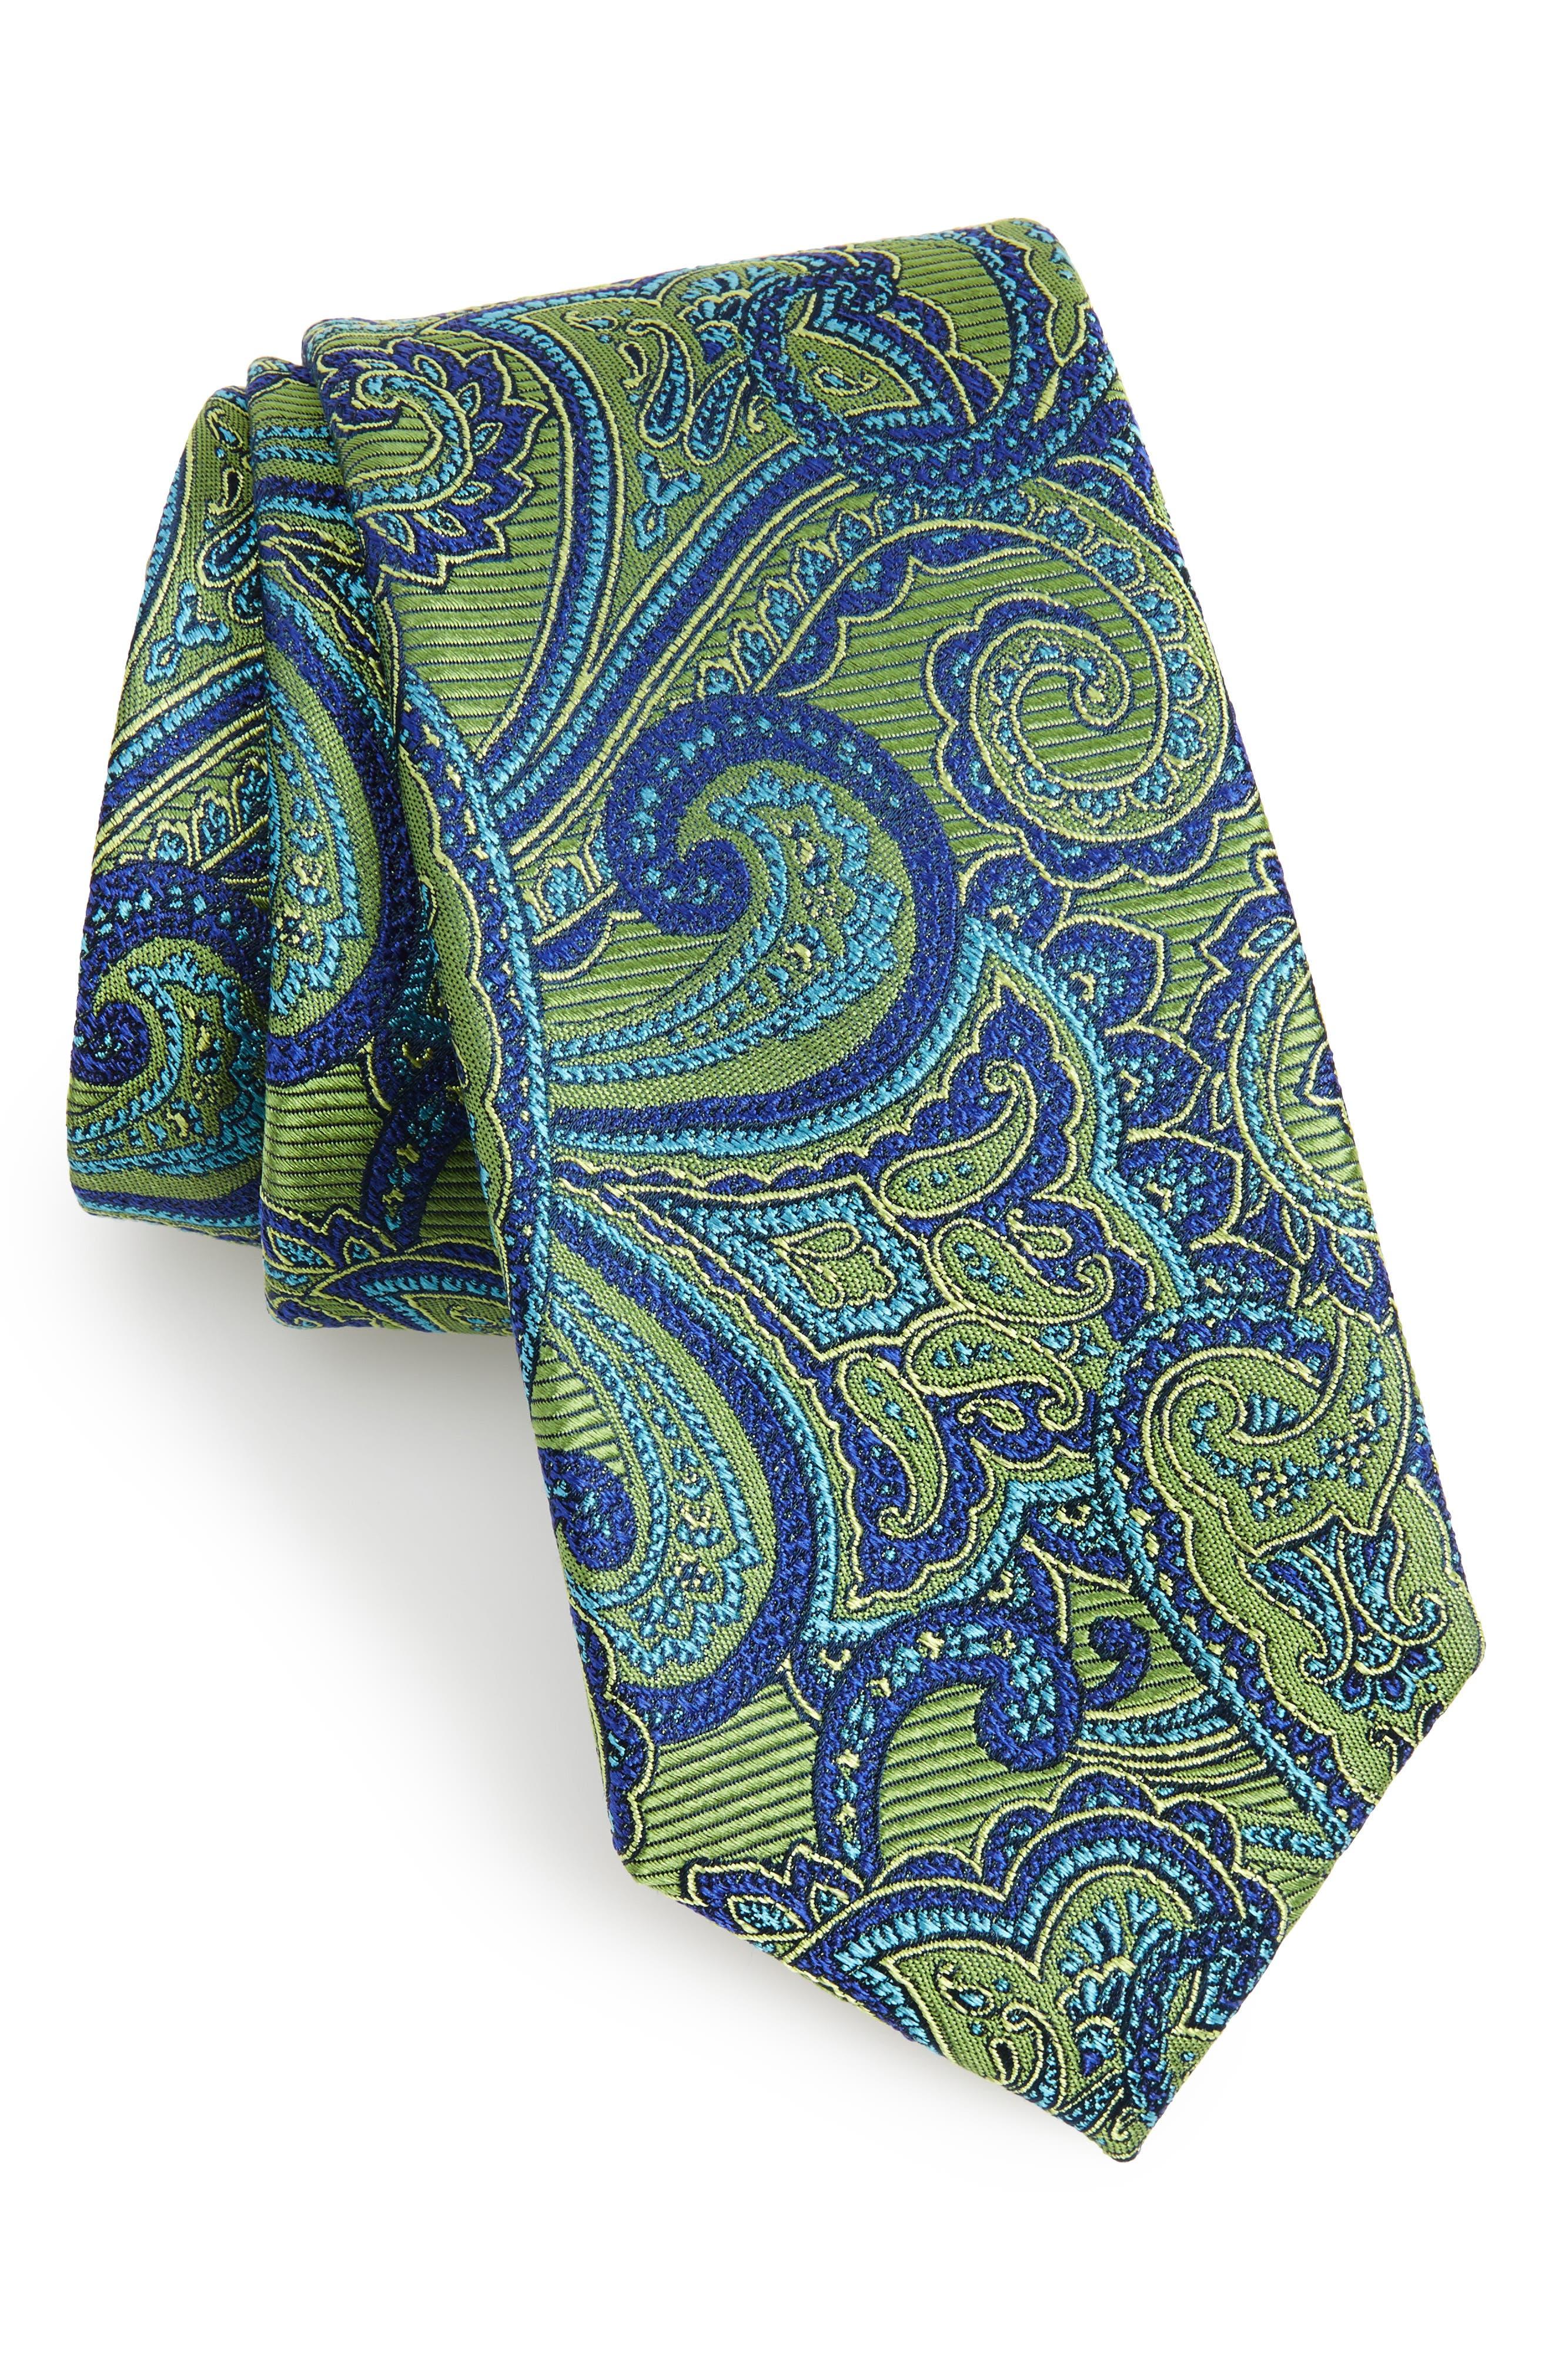 Nordstrom Men's Shop Avalon Paisley Silk Tie